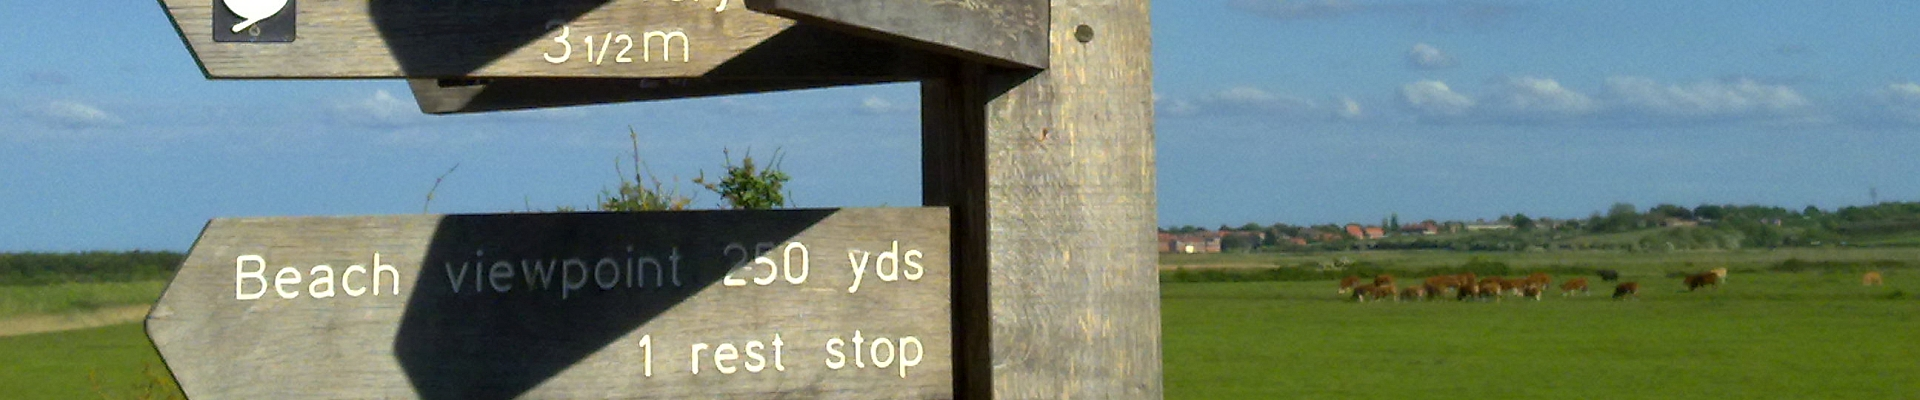 signpost Norfolk Coast Path Xtrahead photography